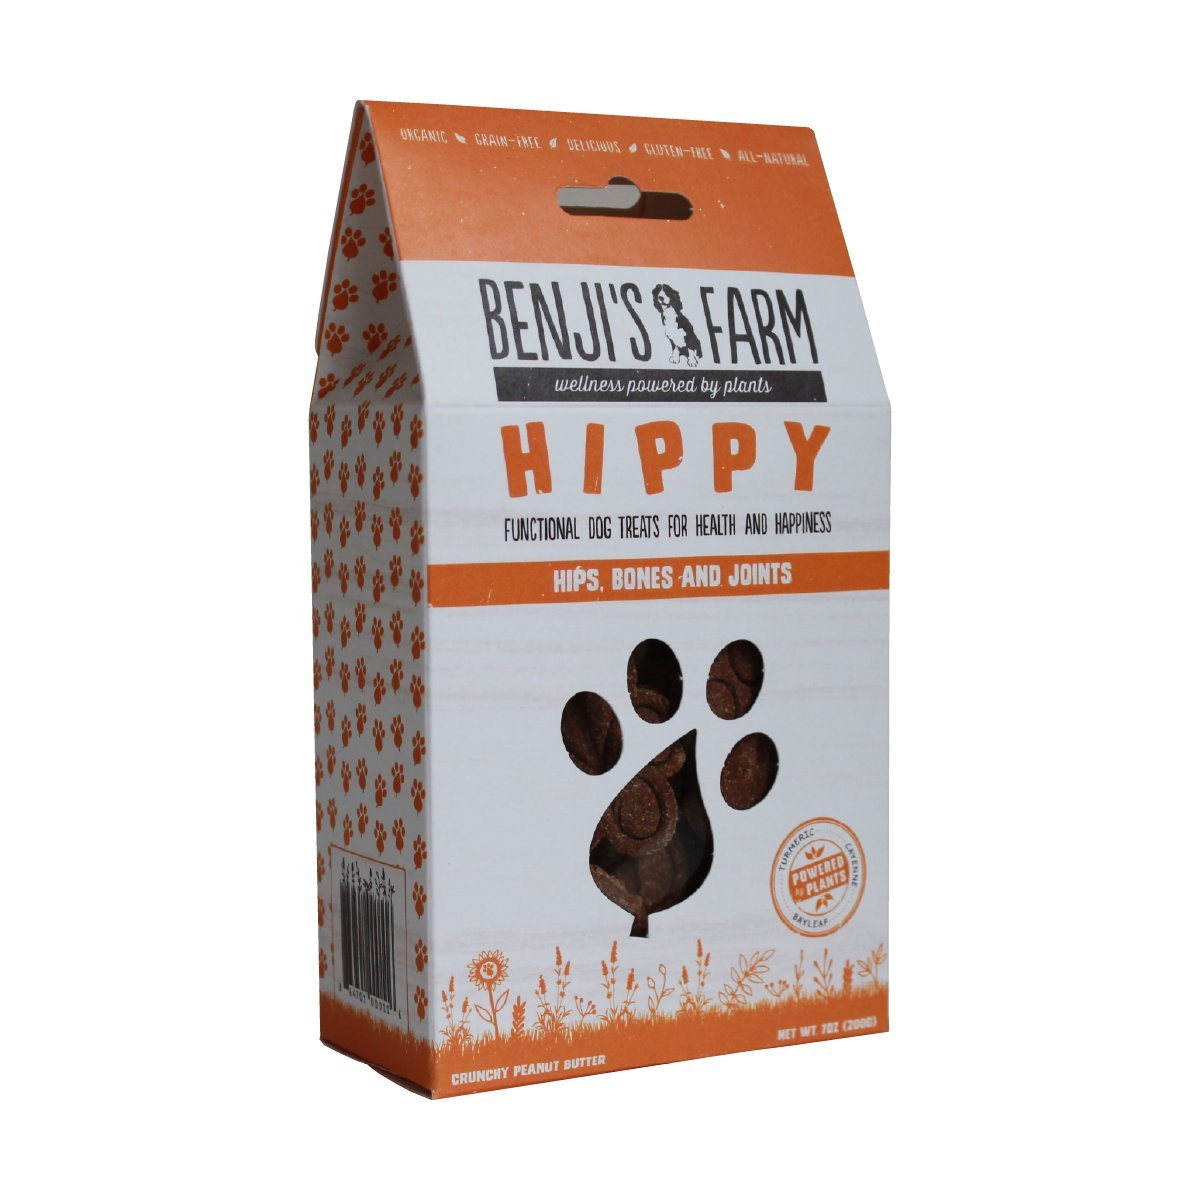 Benji's Farm Organic Functional Dog Treats - Crunchy Peanut Butter - 7oz